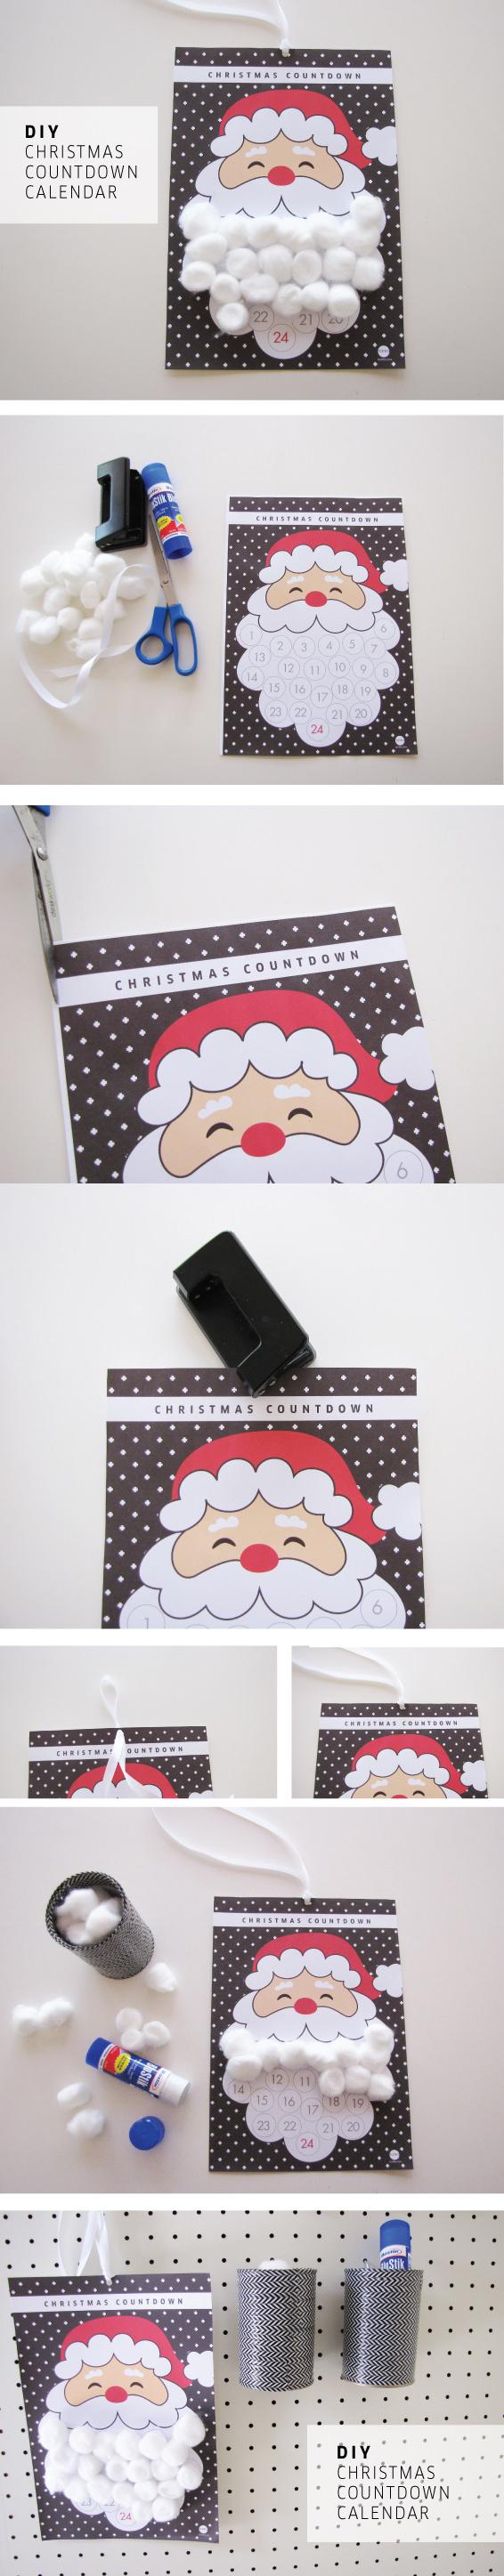 TOMFO-Christmas-calendarTUTORIAL1